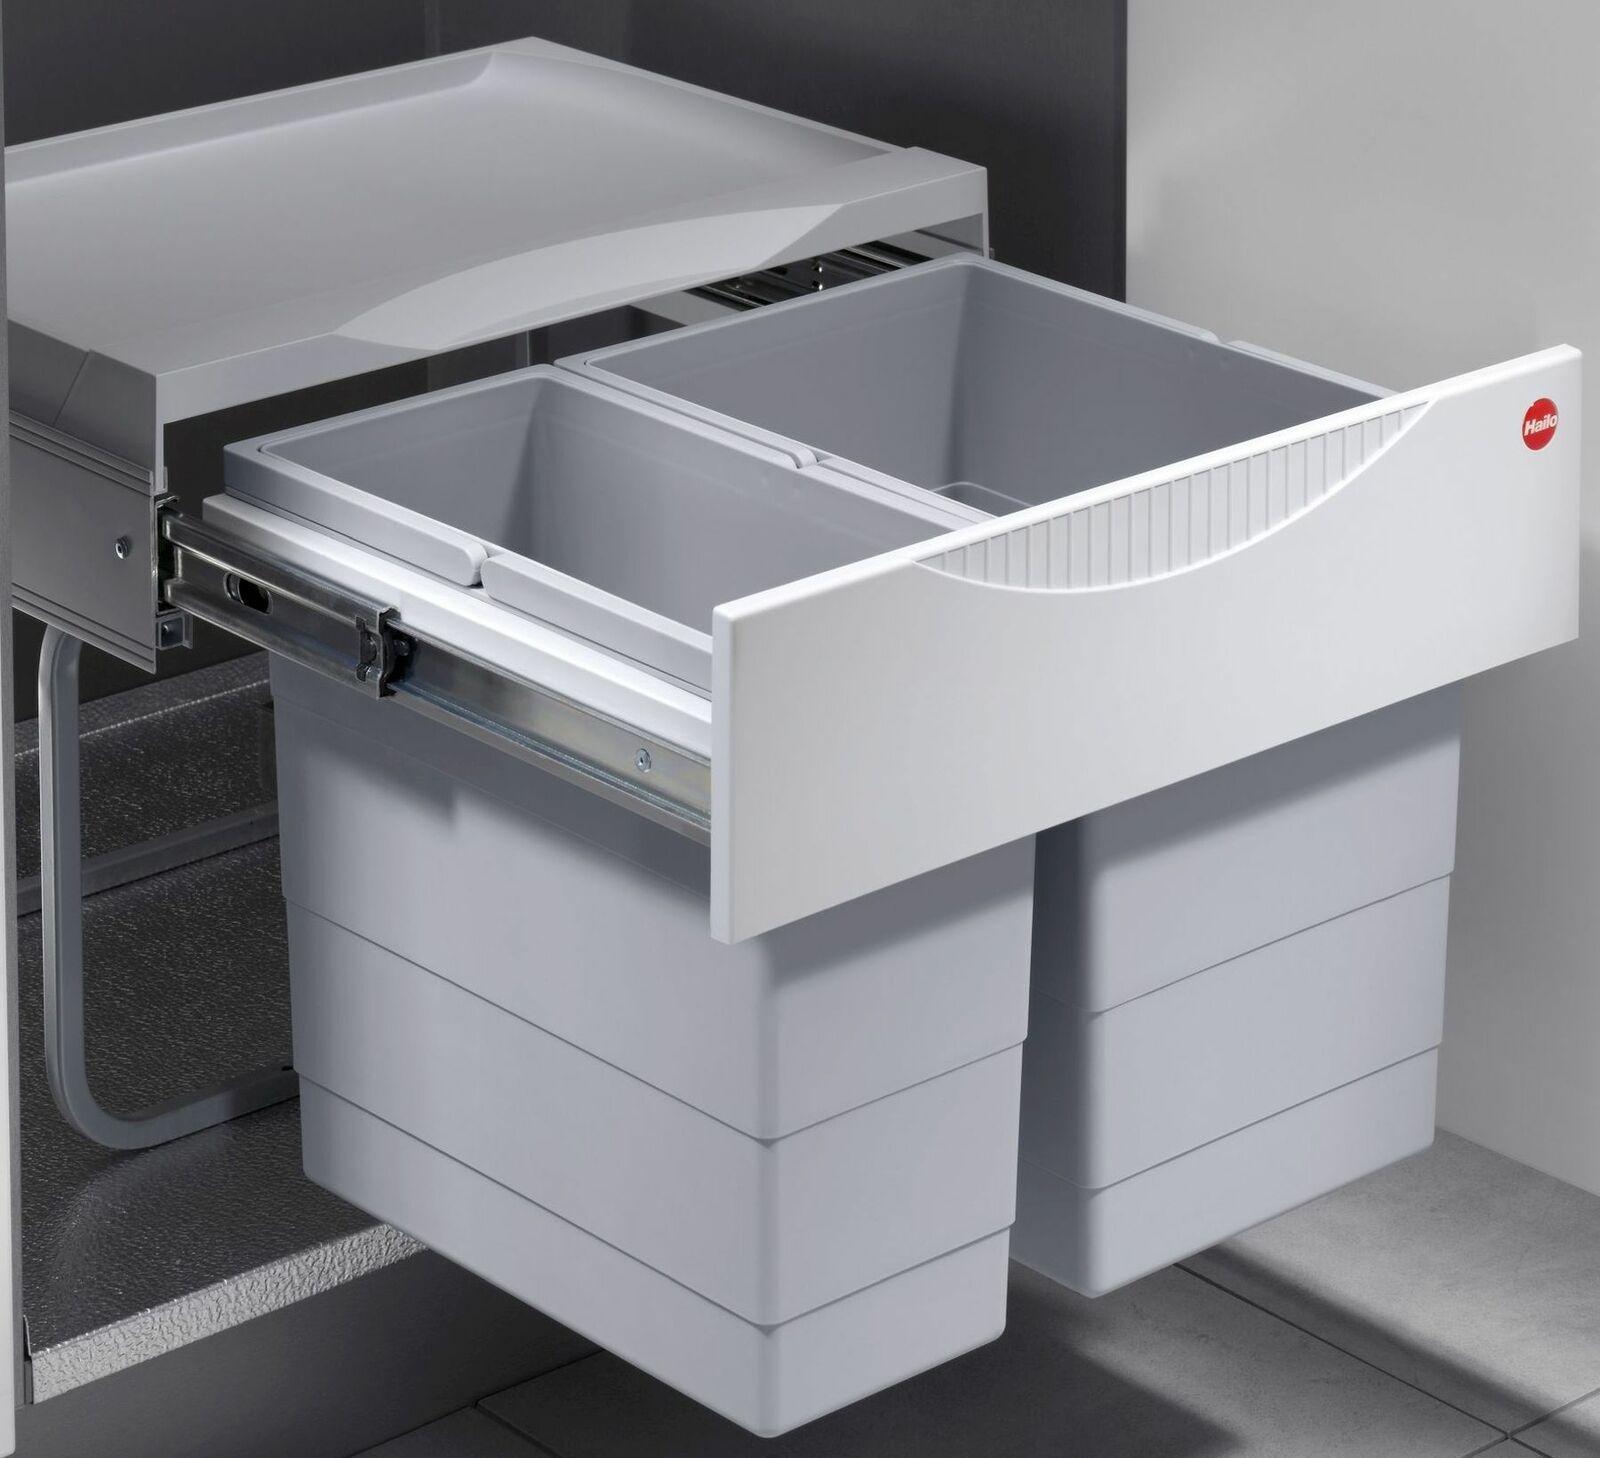 Mülleimer Küche 30 Liter Hailo Einbau Abfalleimer Müllsammler Müllsystem  *516049